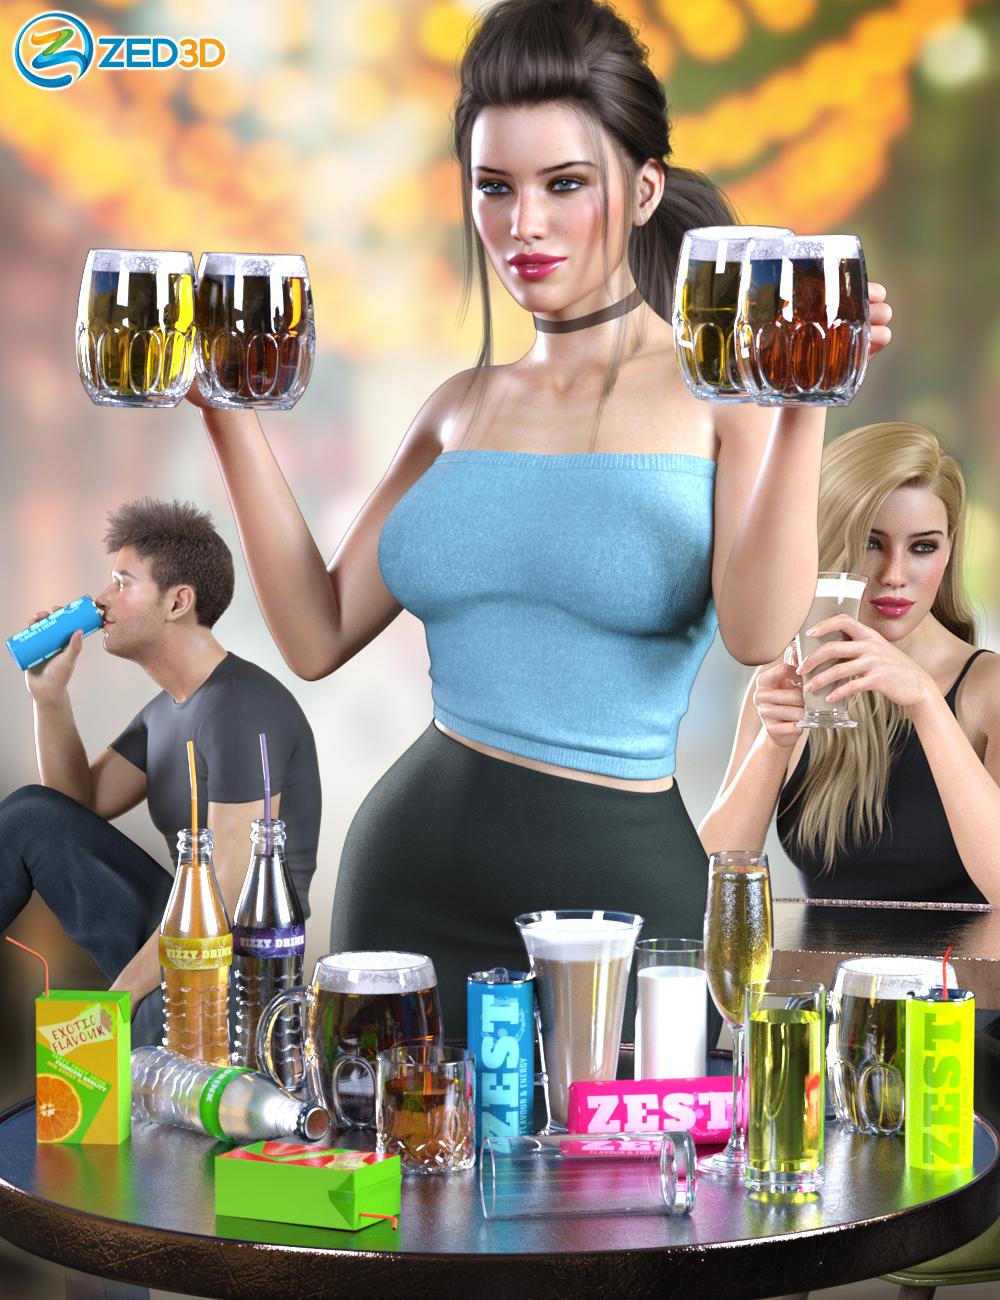 Z Drinks Aplenty Props and Poses for Genesis 8 by: Zeddicuss, 3D Models by Daz 3D